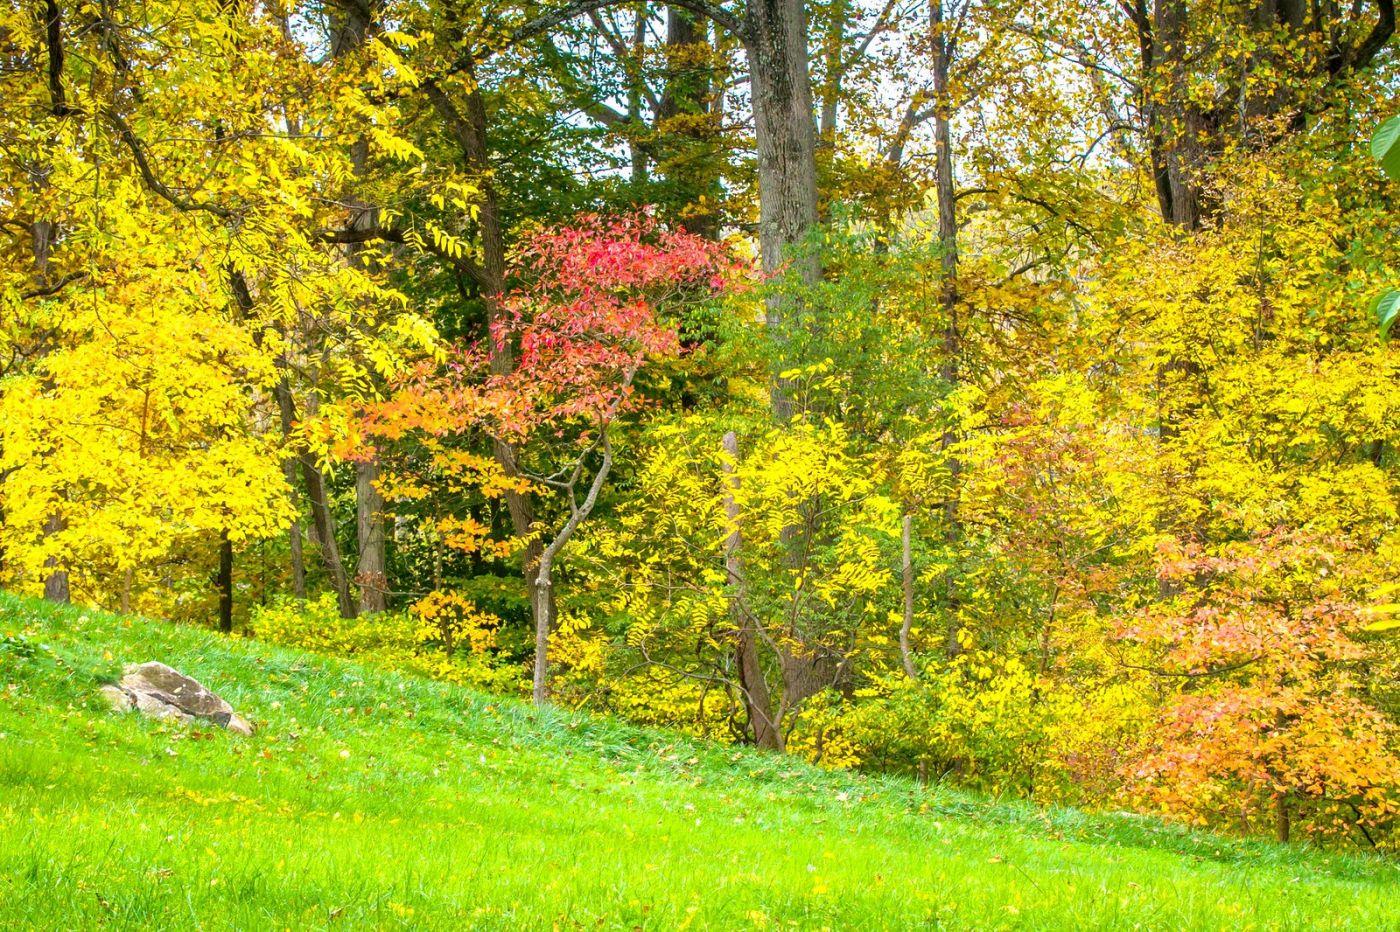 Chanticleer花园,季季有色彩_图1-9